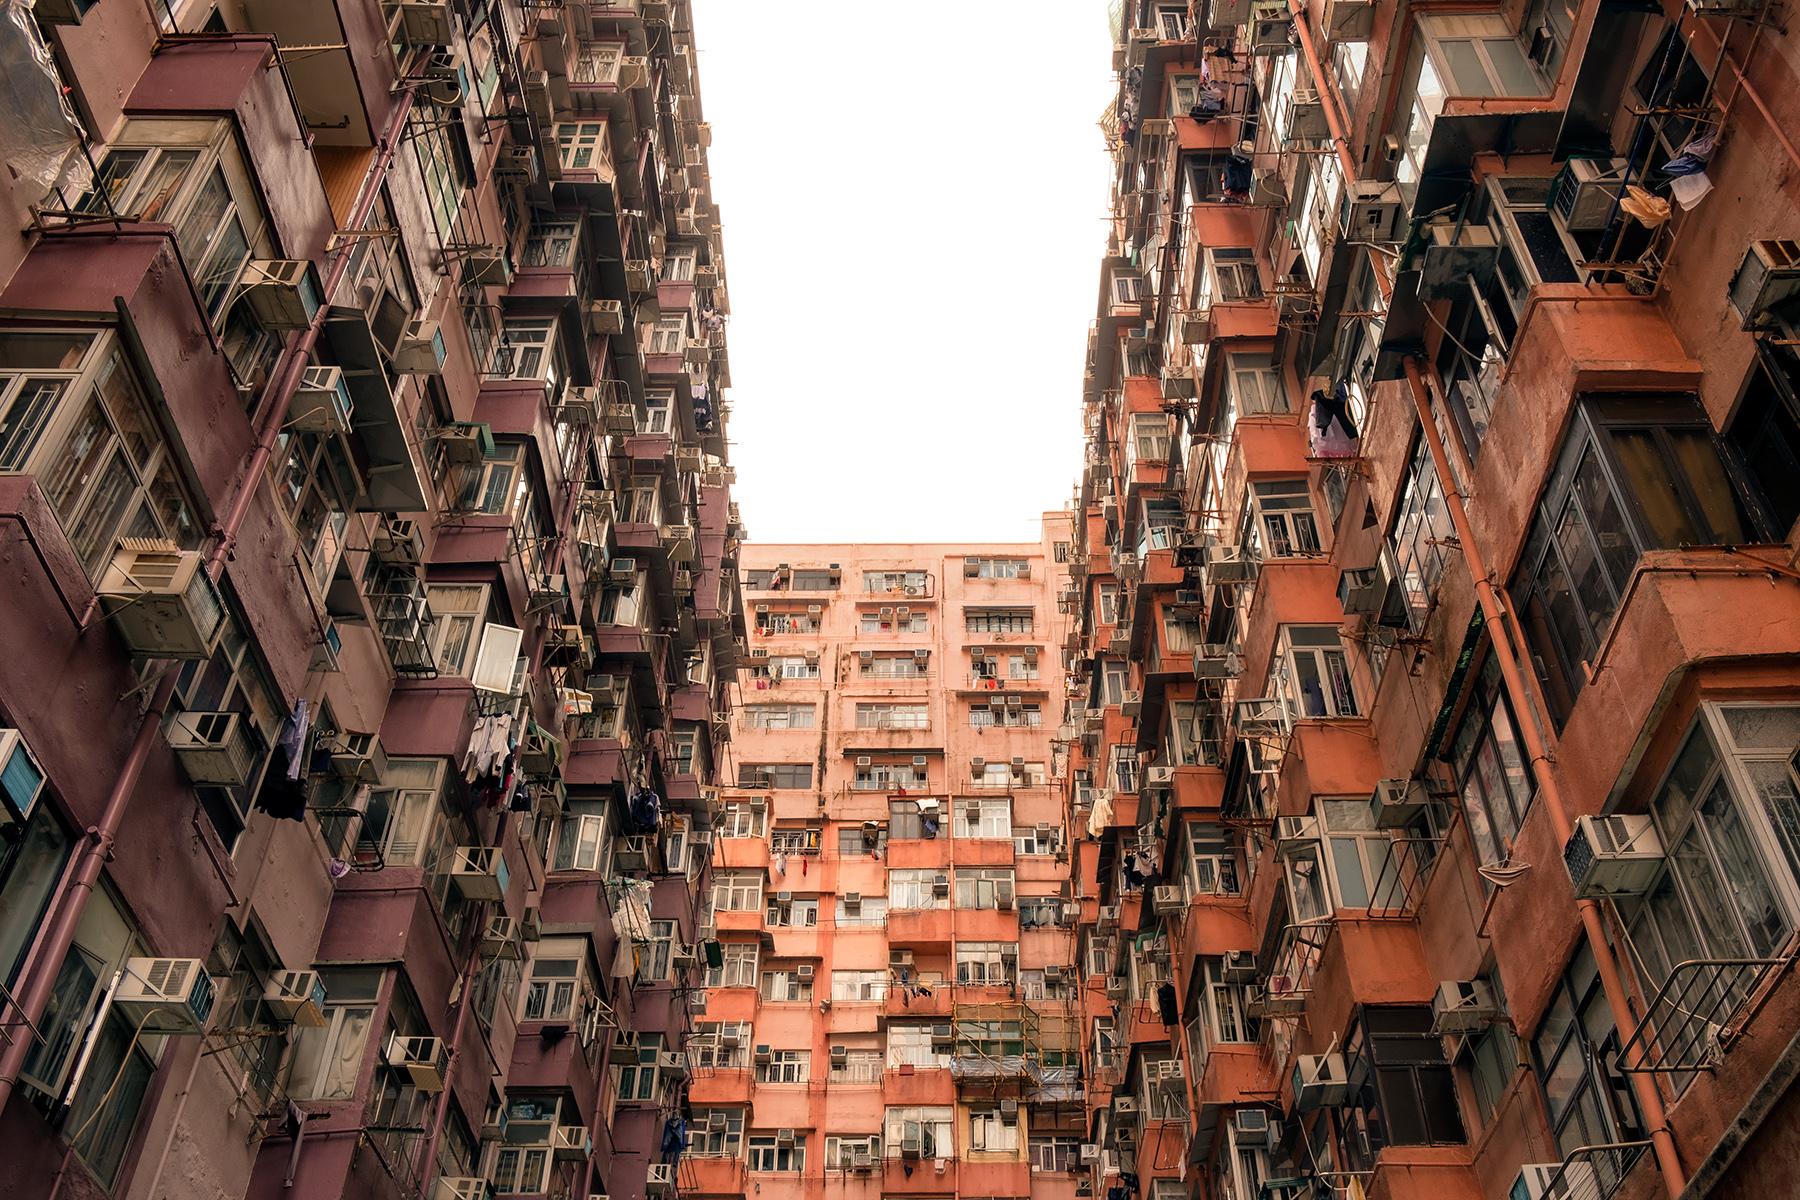 Doug_Caplan_Hong-Kong-Brutal-Compressions_Untitled_06.jpg